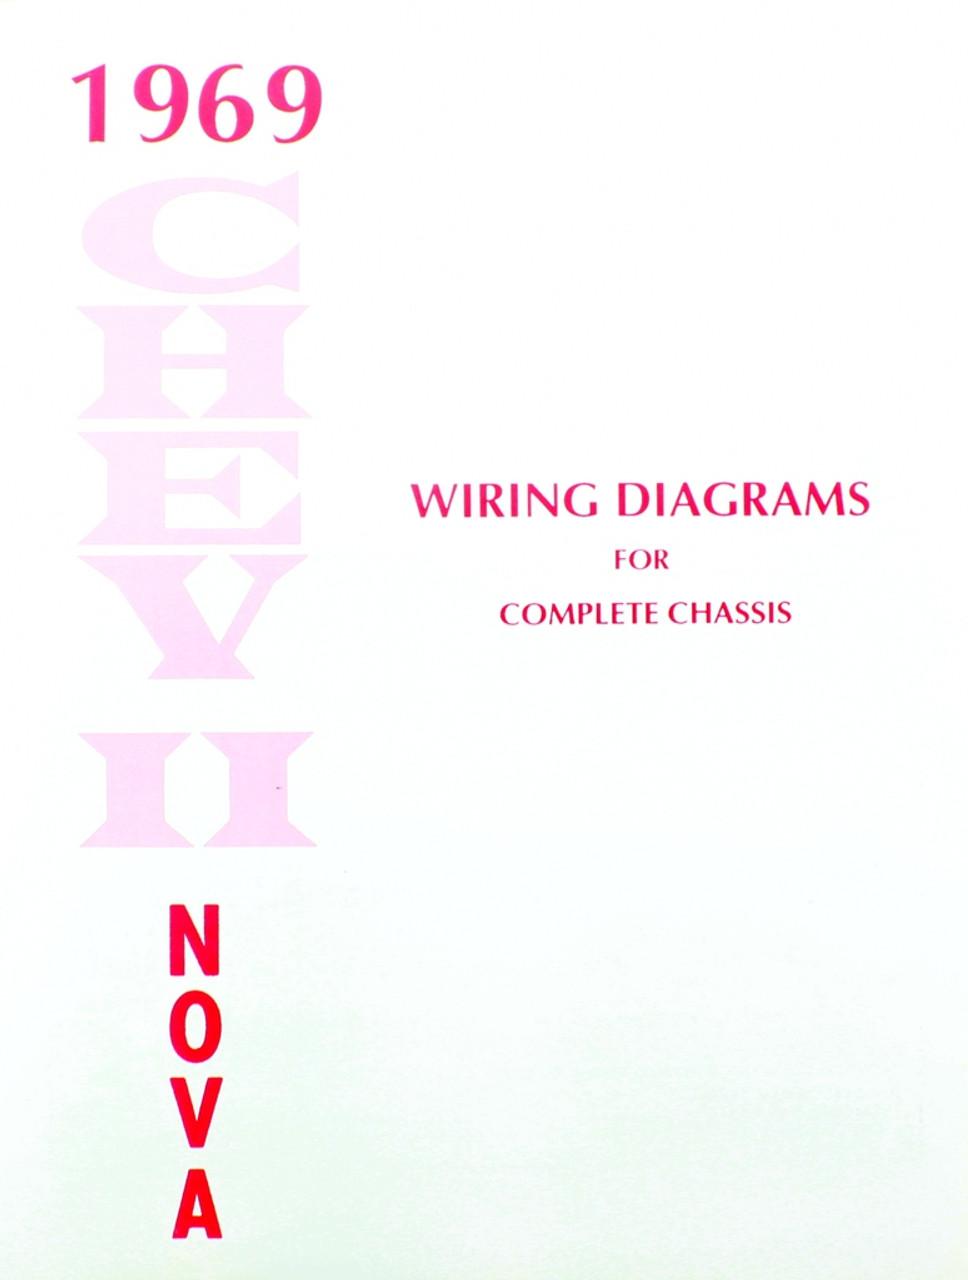 69 1969 CHEVY NOVA ELECTRICAL WIRING DIAGRAM MANUAL - I-5 Classic ...